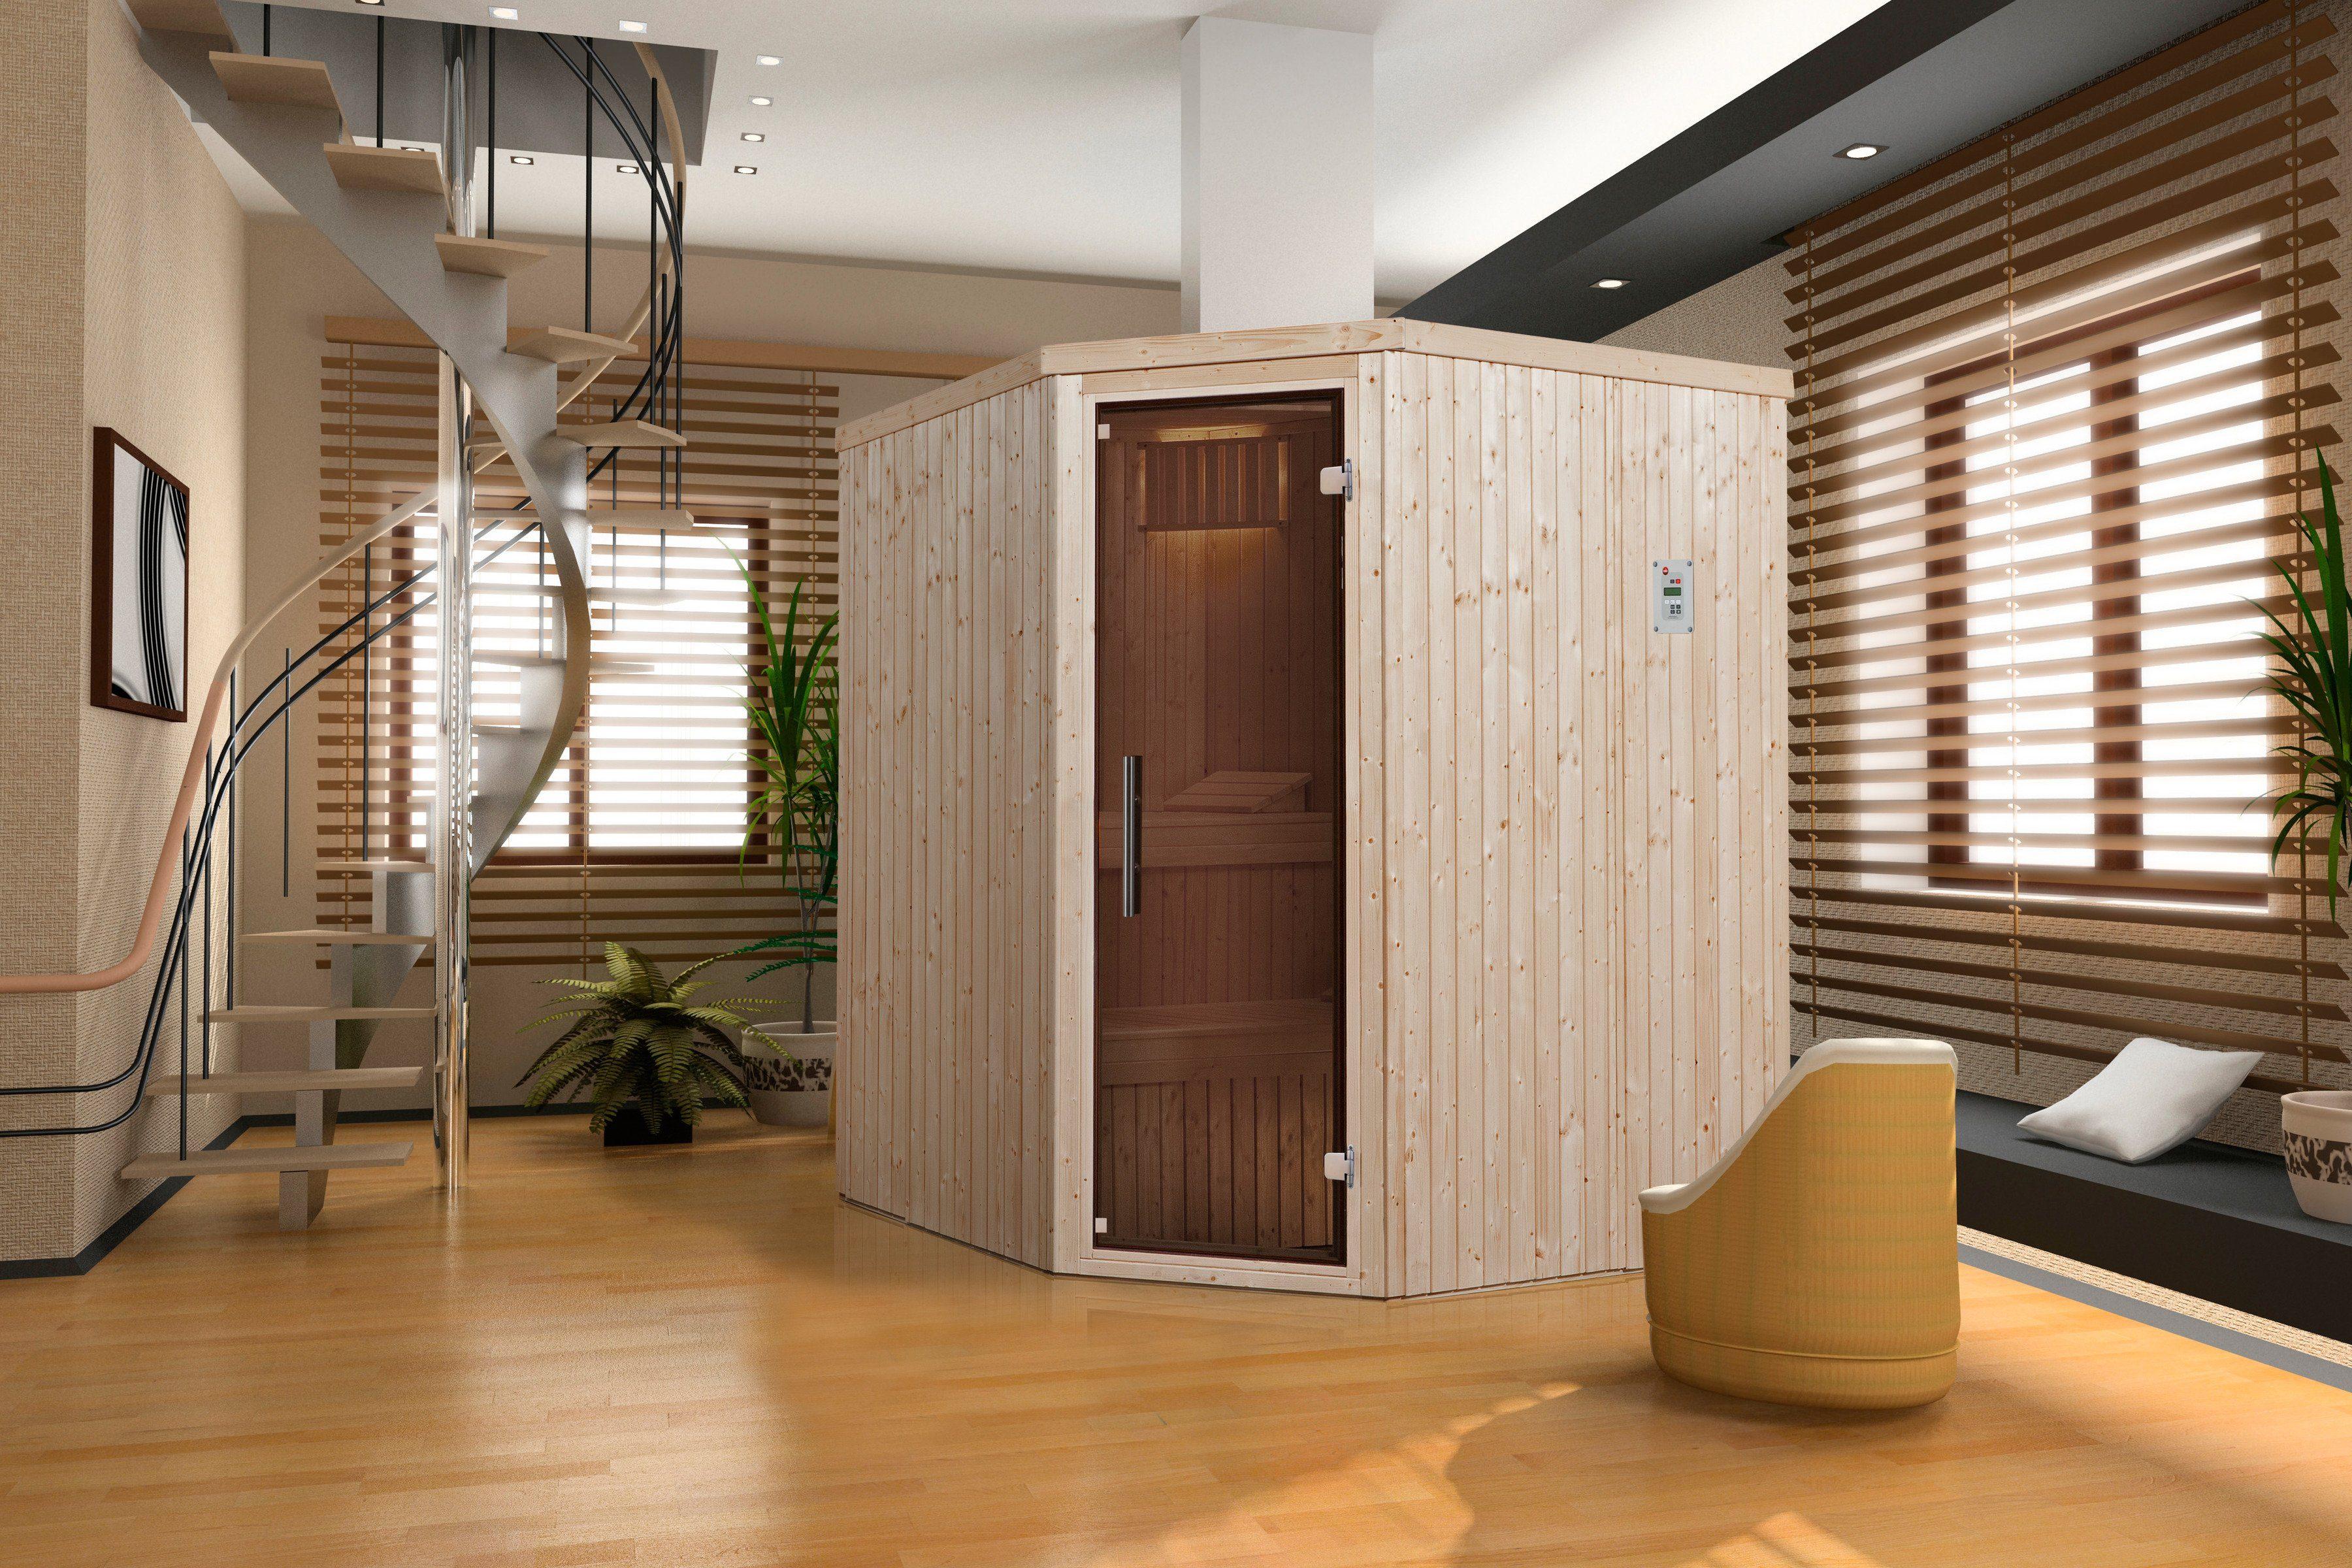 Sauna »Lyngdal 3 Trend OS«, 192/175/199 cm, 68 mm, 7,5-KW-Ofen